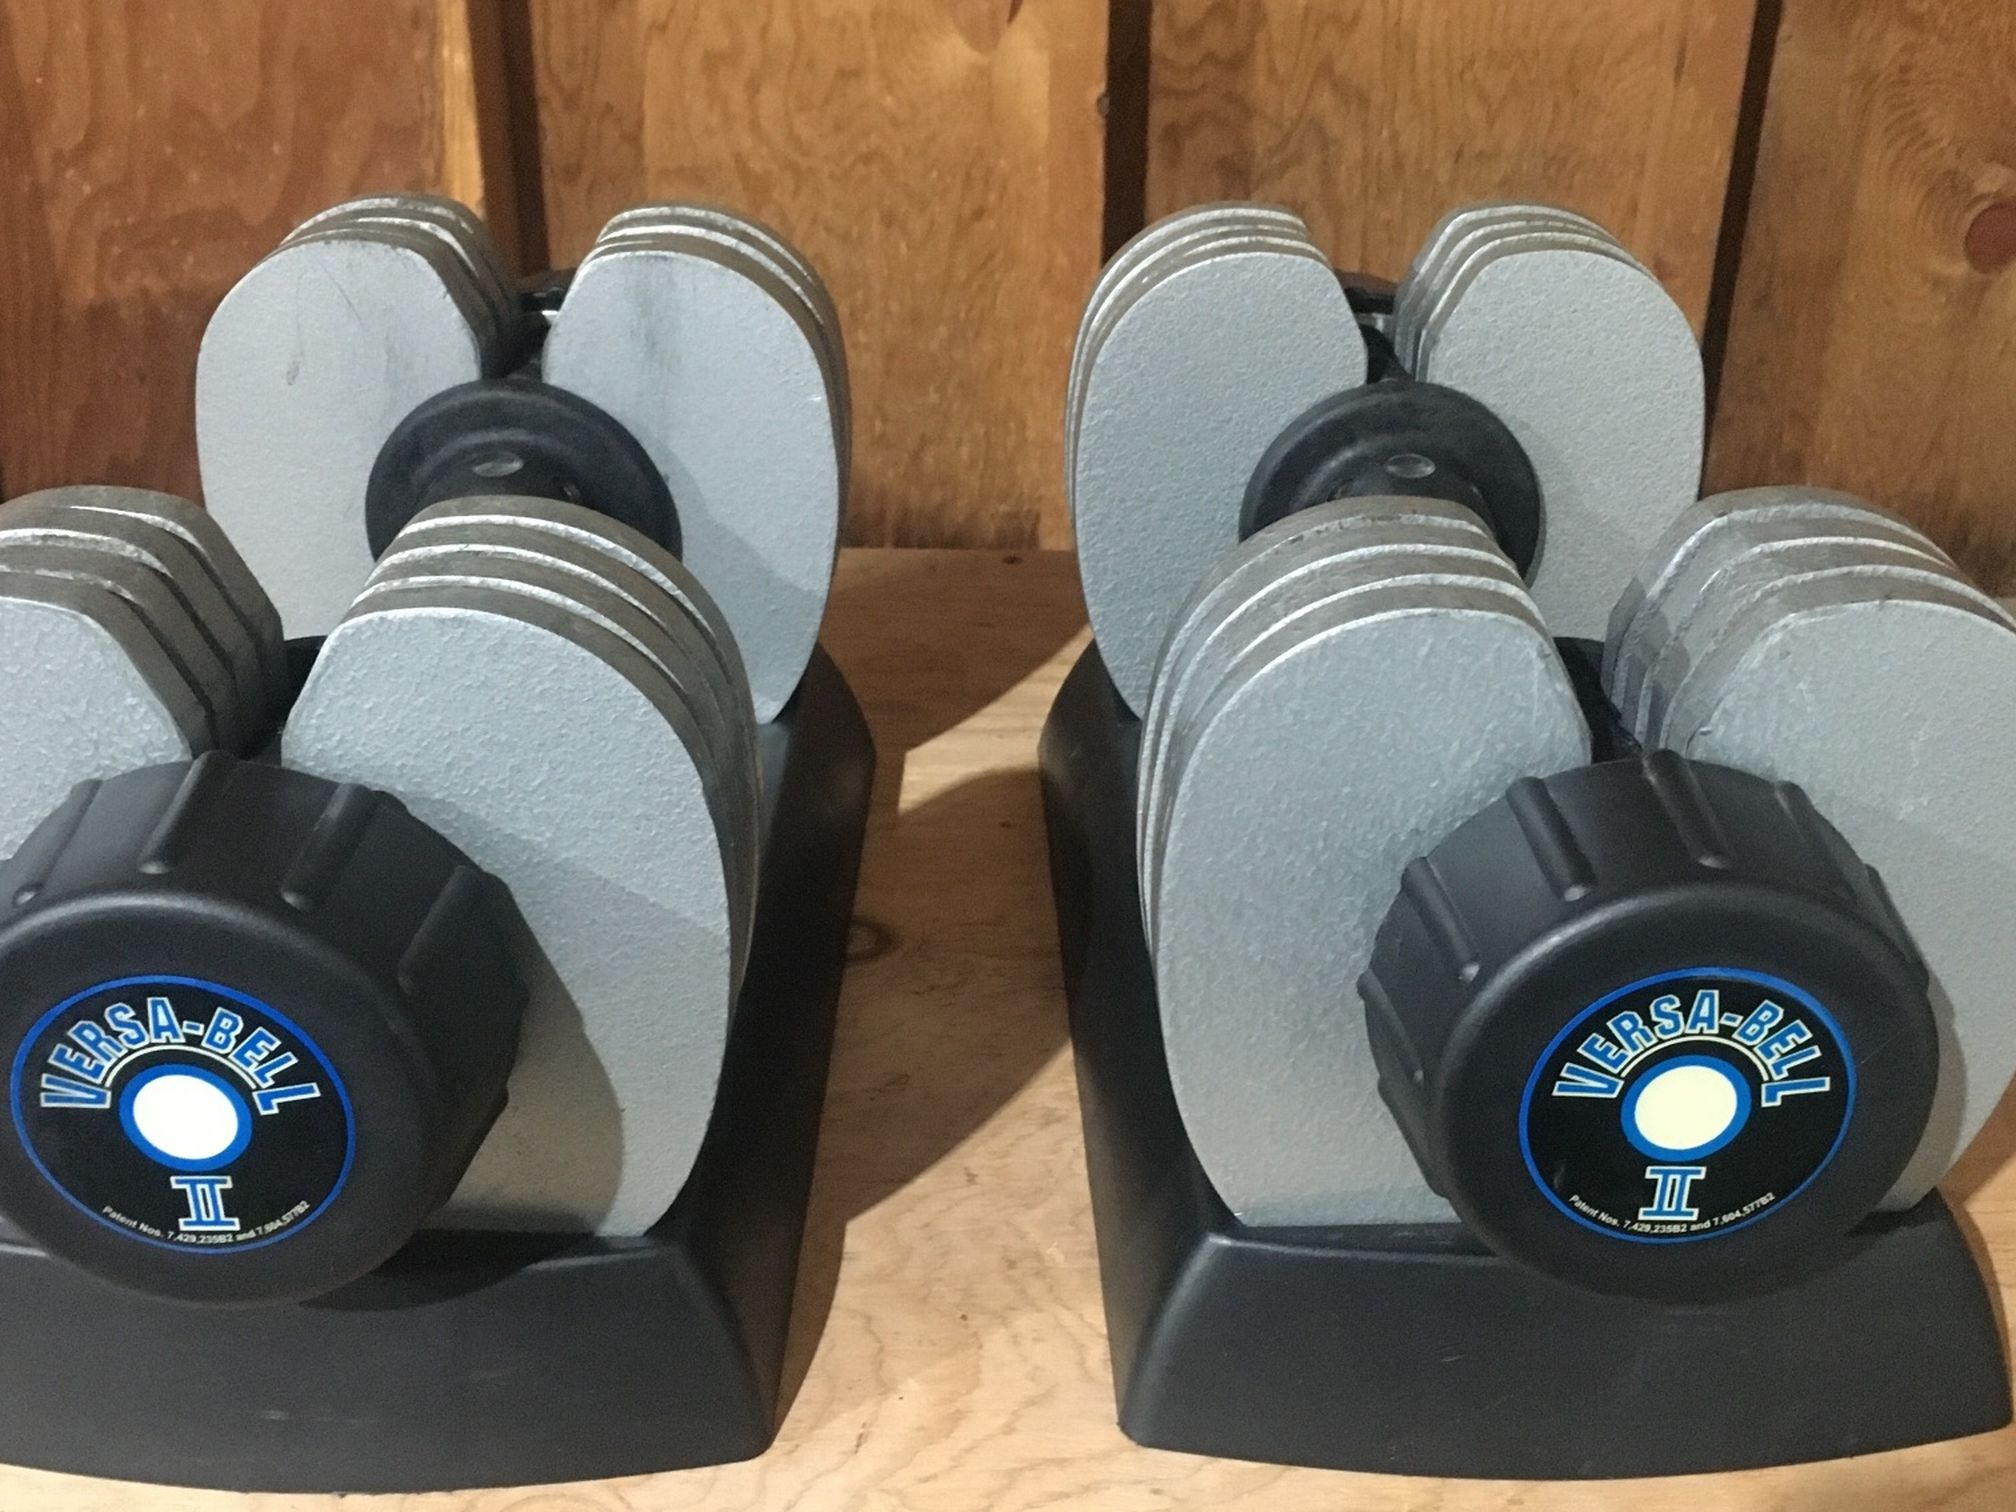 Versa-bell Adjustable Dumbbells